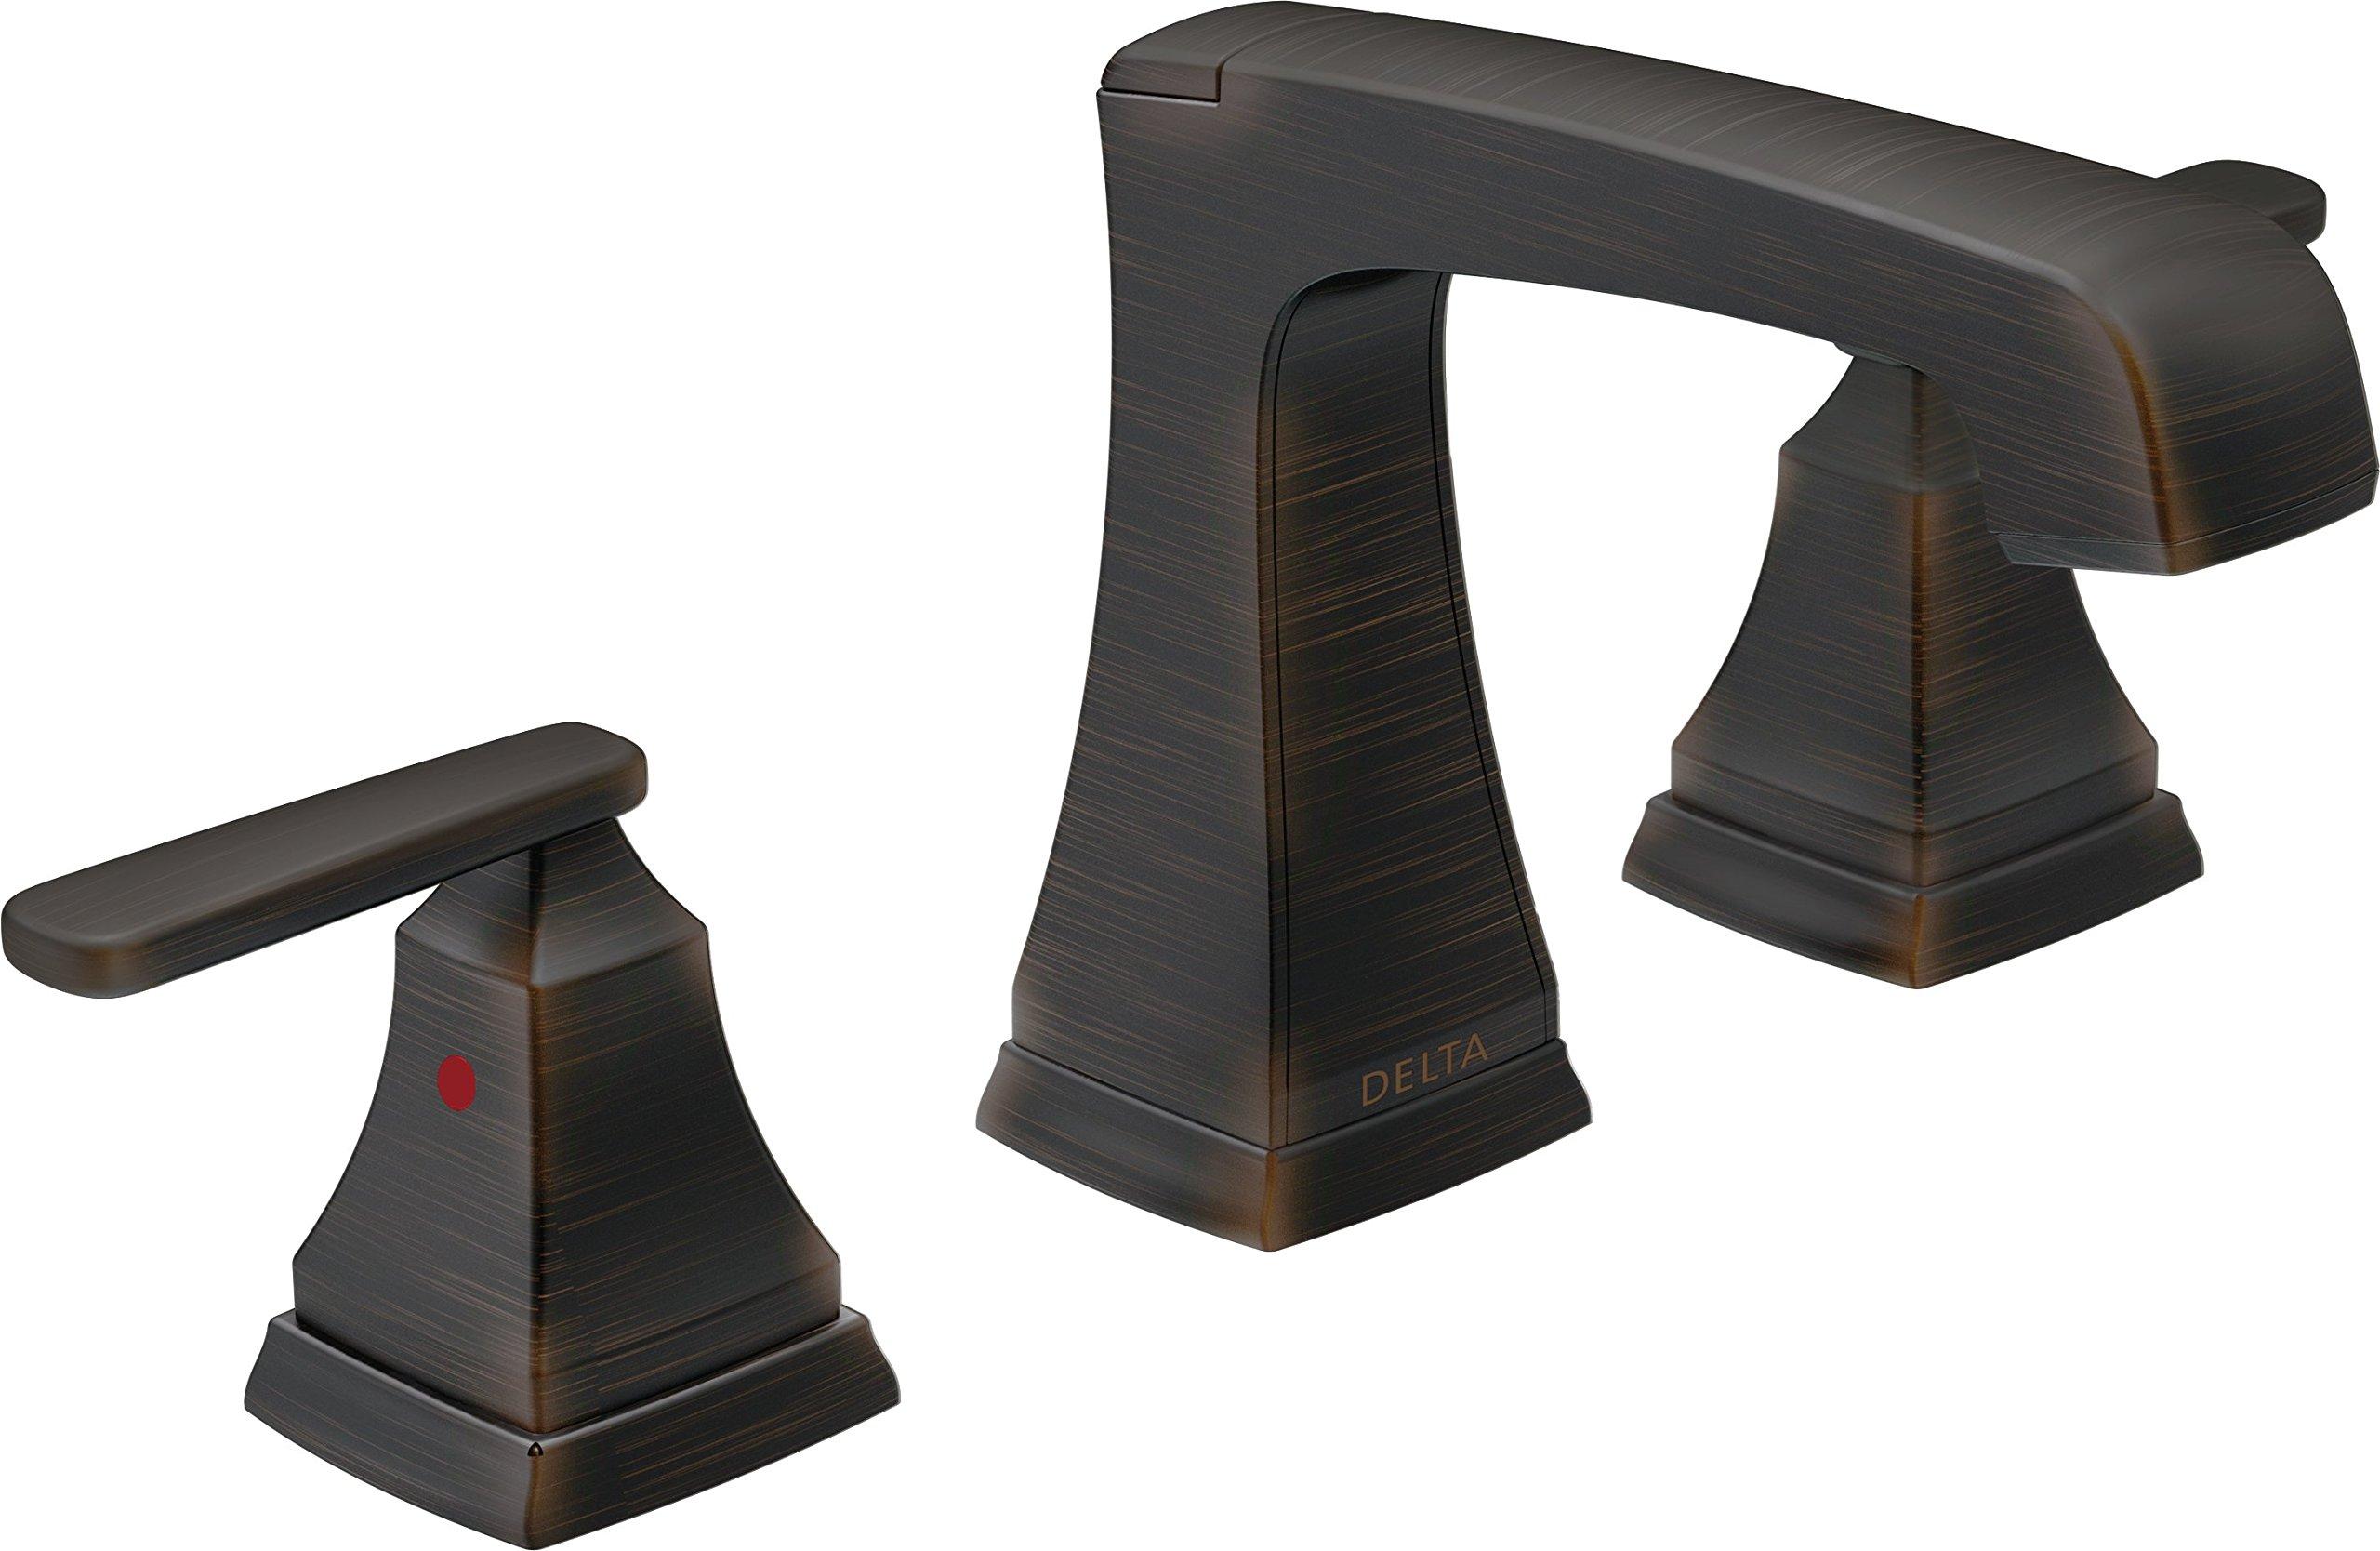 Delta Faucet 3564-RBMPU-DST Ashlyn Two Handle Widespread Bathroom Faucet, Venetian Bronze